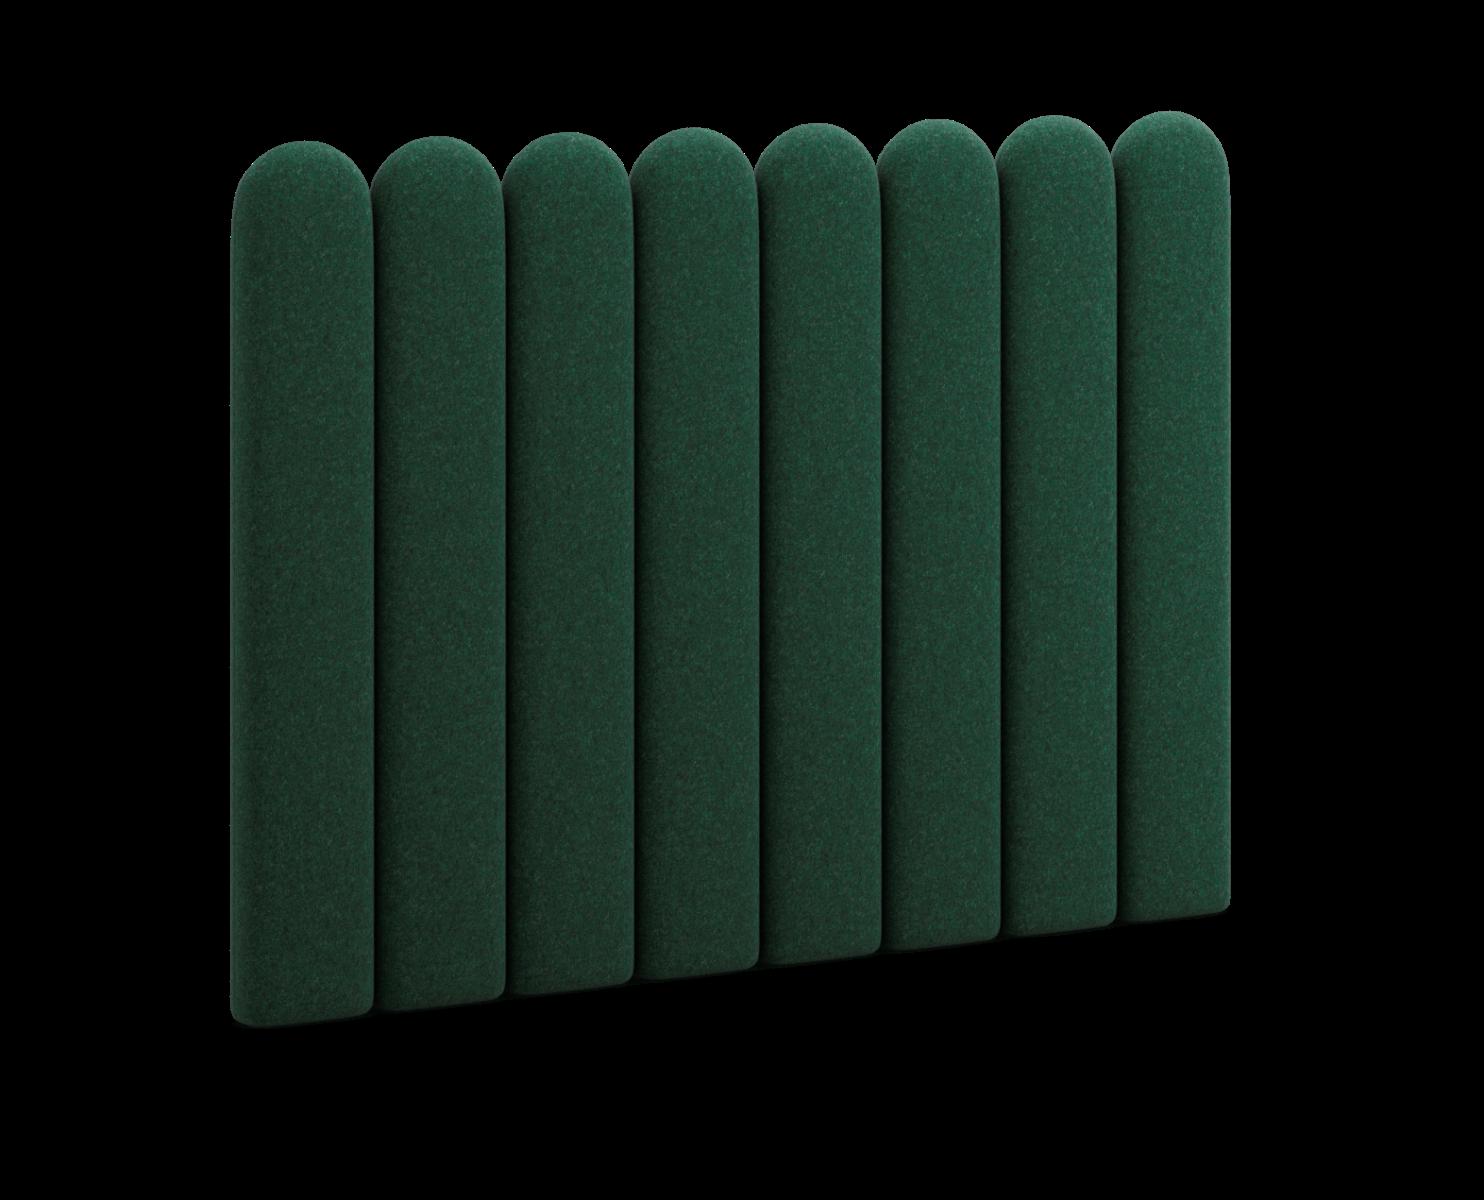 Køb Ovia Fluctus - 210x120x6 Grønn